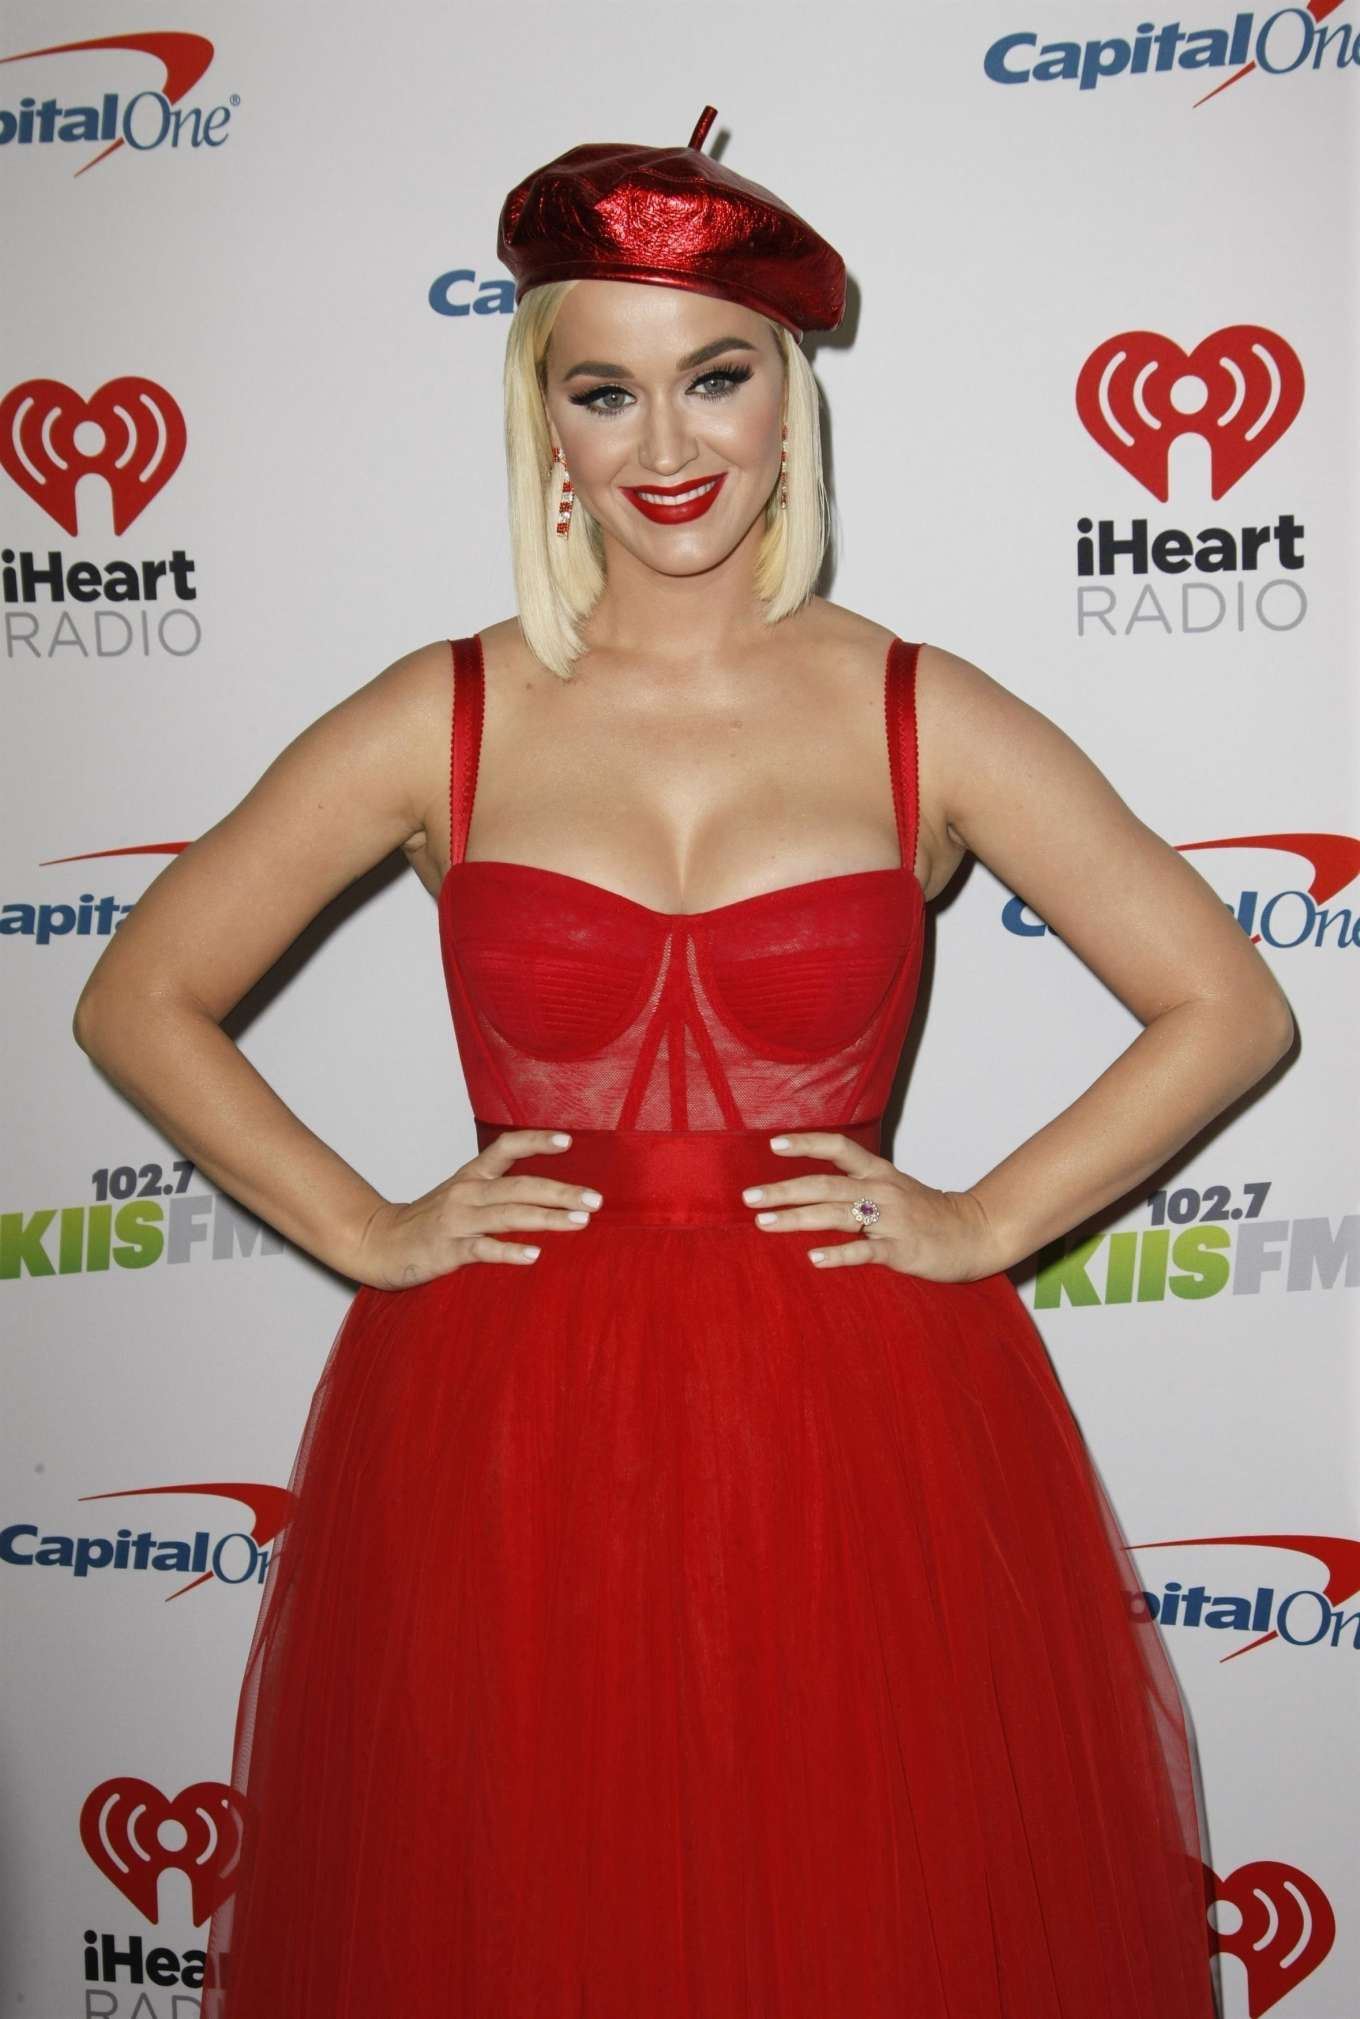 Katy Perry 2019 : Katy Perry – 2019 KIIS FMs iHeartRadio Jingle Ball-15